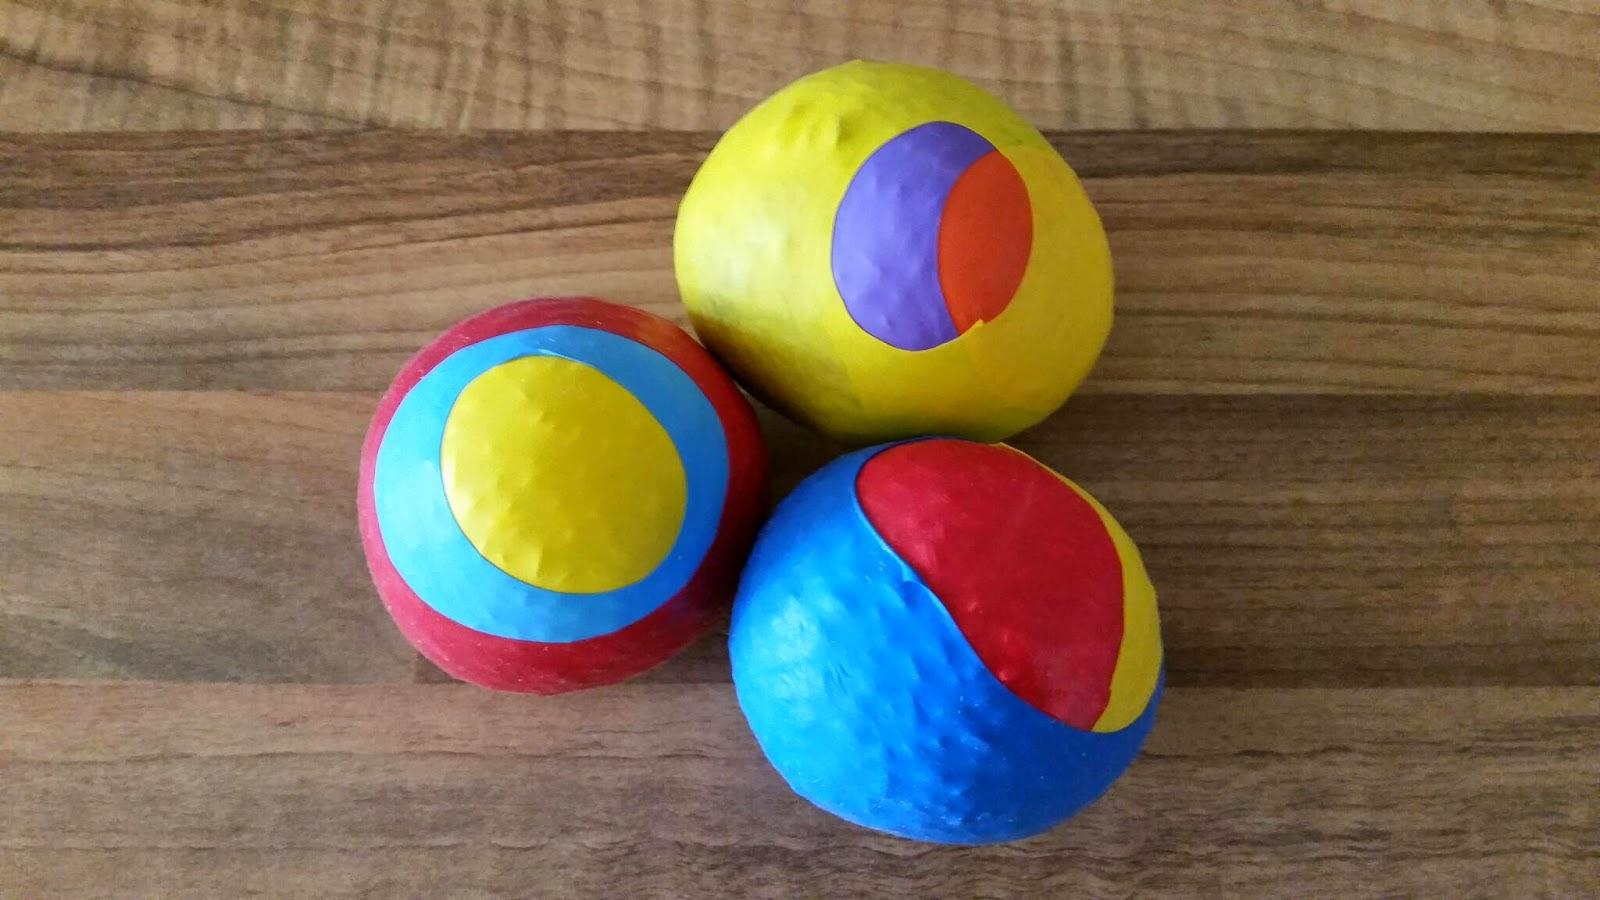 Shots toys - bolas pesadas acero inoxidable ben-wa